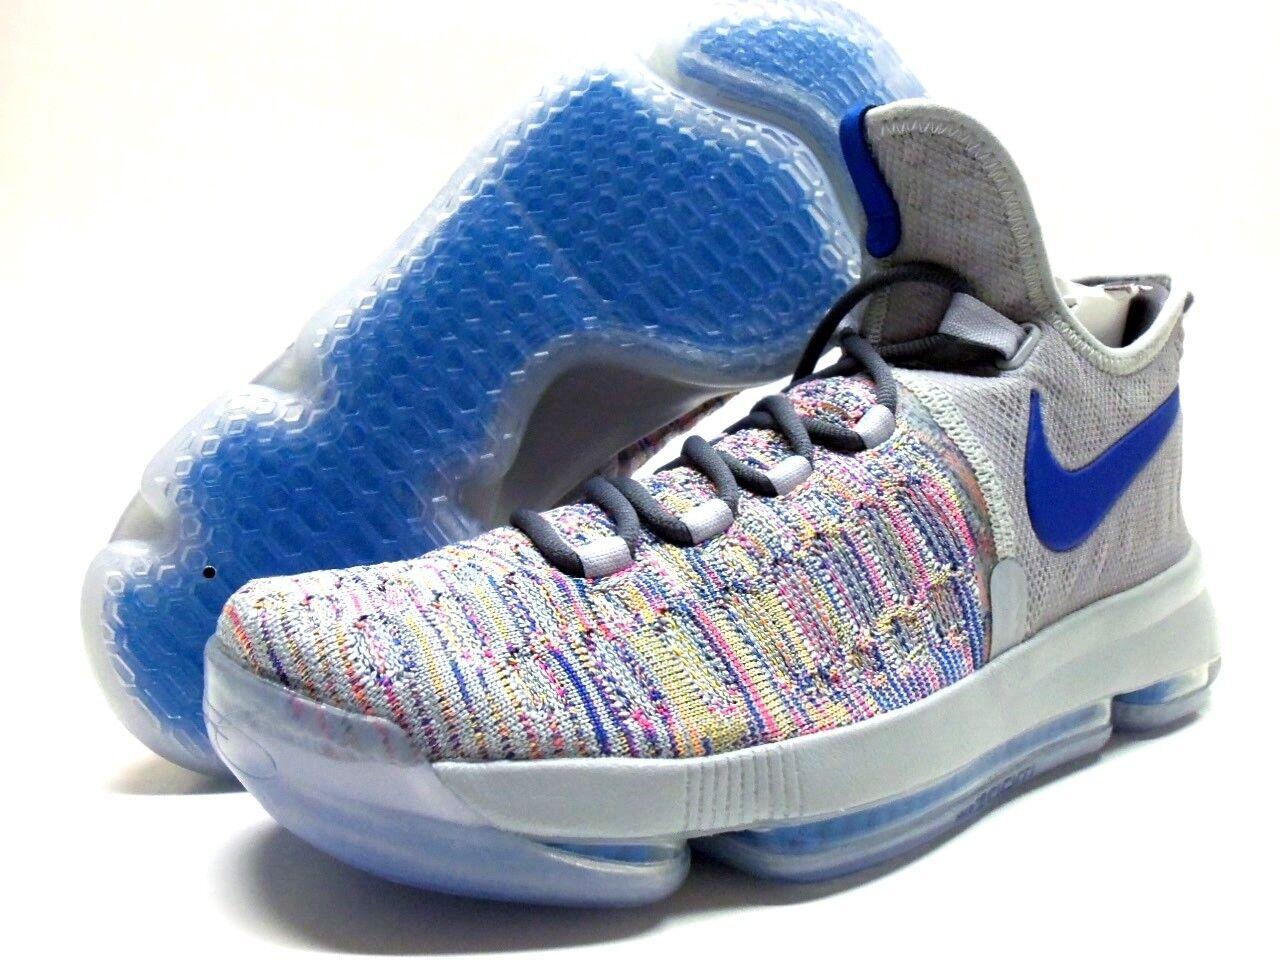 Nike kd 9 ix id anthrazit kevin durant multi-color / anthrazit id größe der männer 9. df8e7f